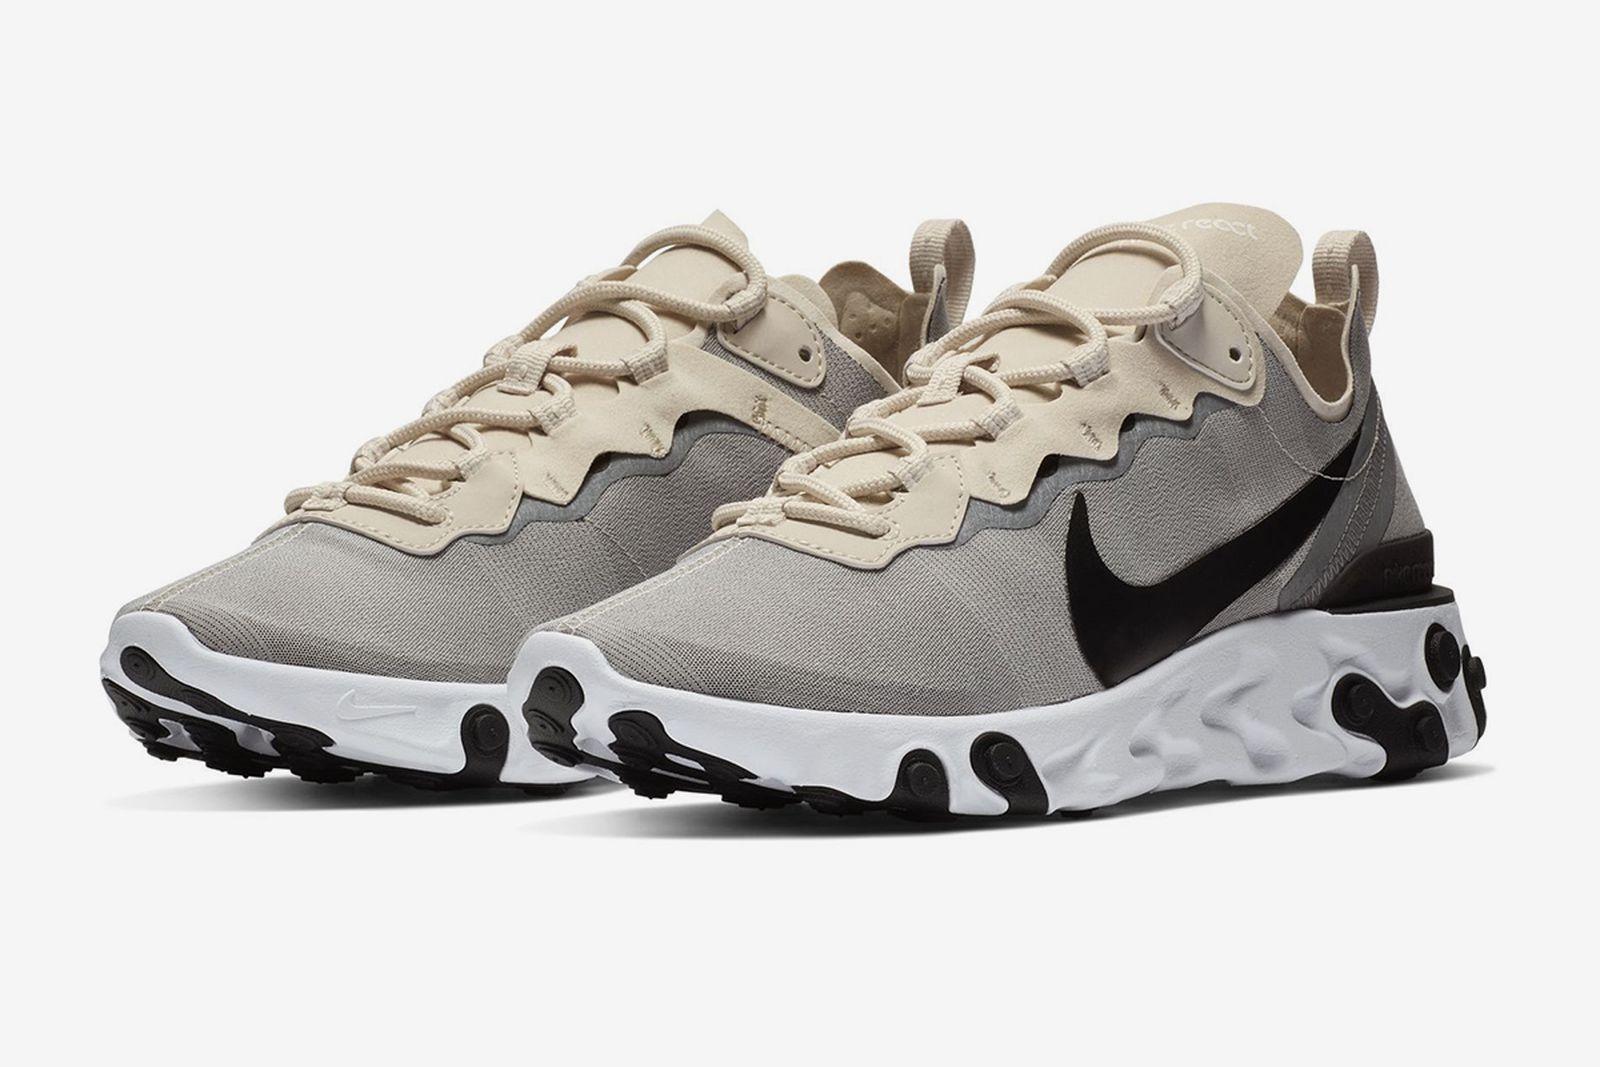 Pasto notificación Aplaudir  Nike React Element 55 in Light Gray Black Is Dropping Soon